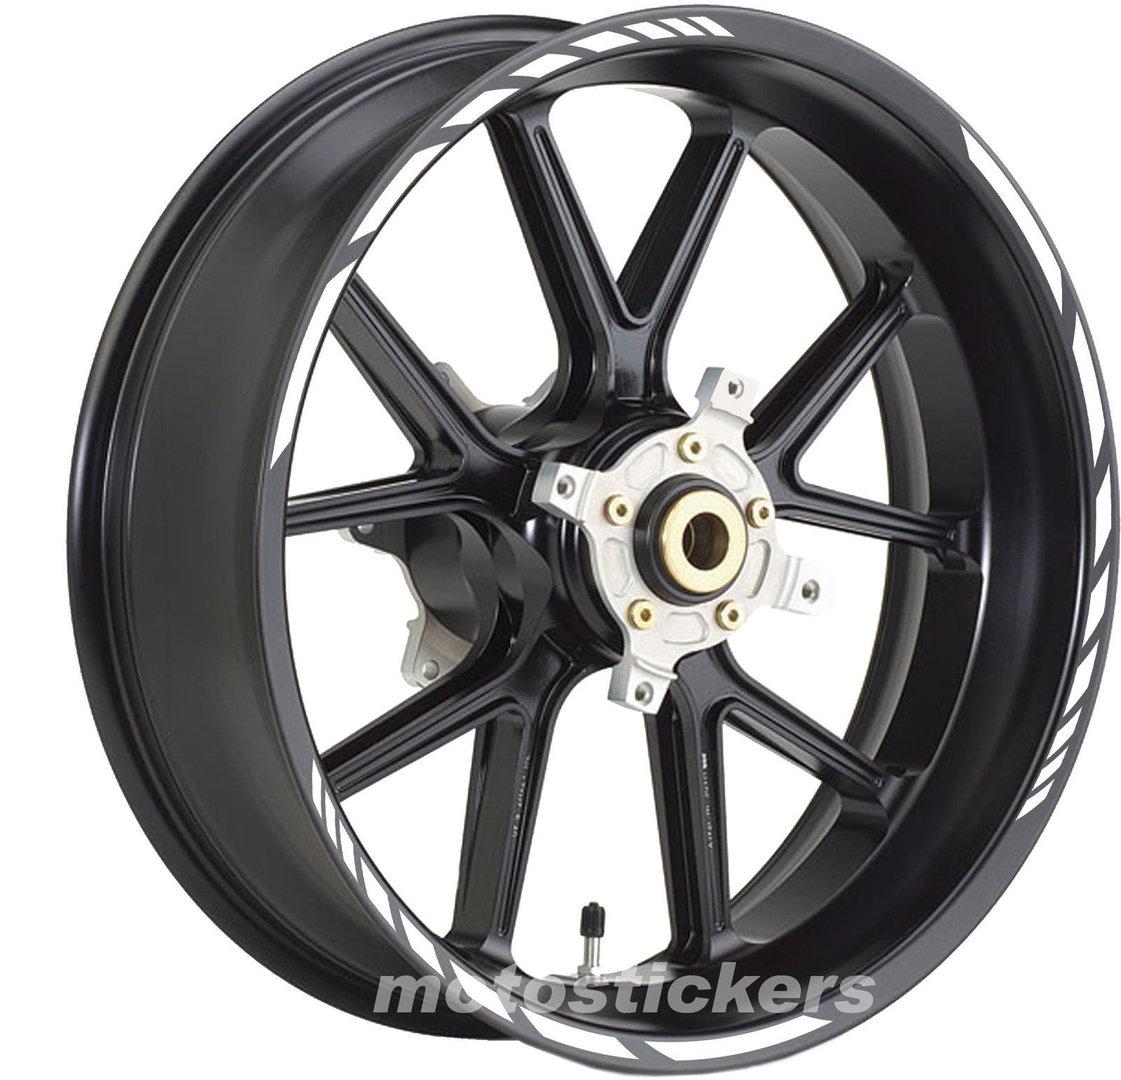 ADESIVI PER CERCHIONI MOTO per APRILIA racing wheels stickers